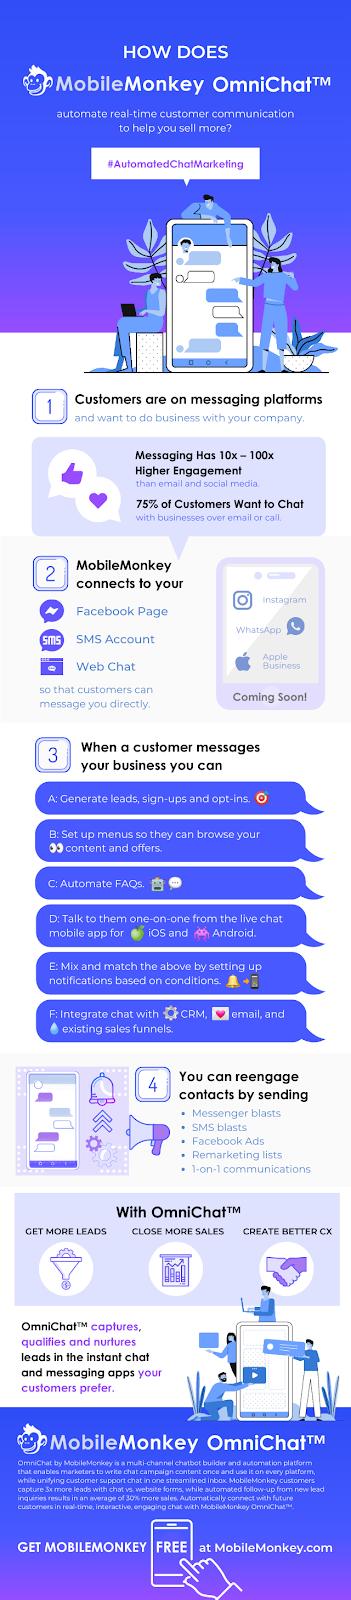 MobileMonkey OmniChat infographic